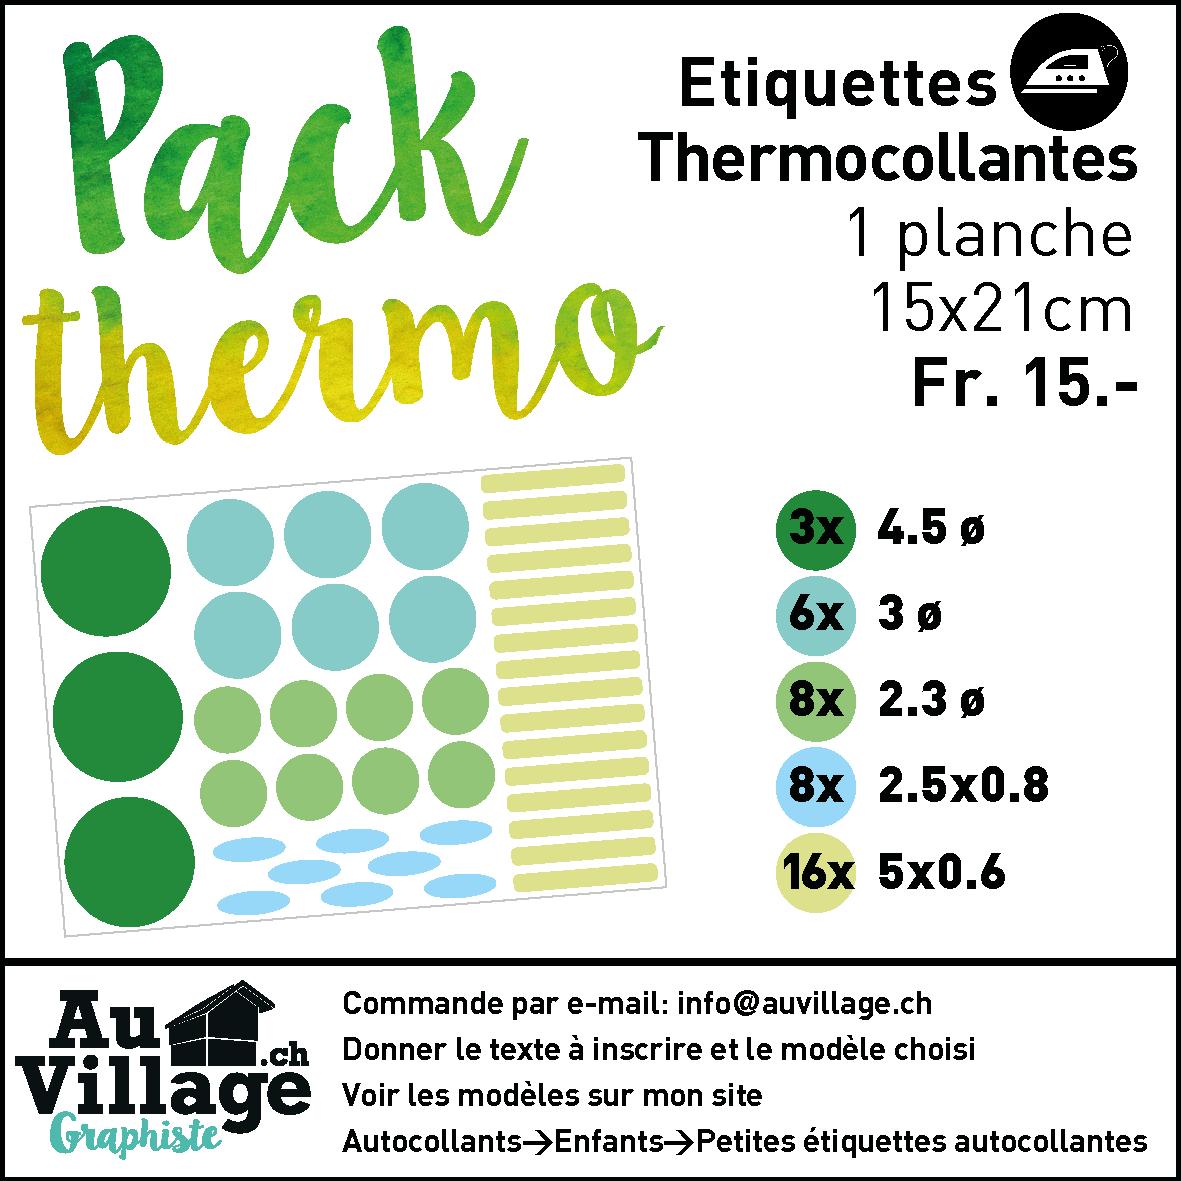 Etiquettes_vinyle&thermo-02